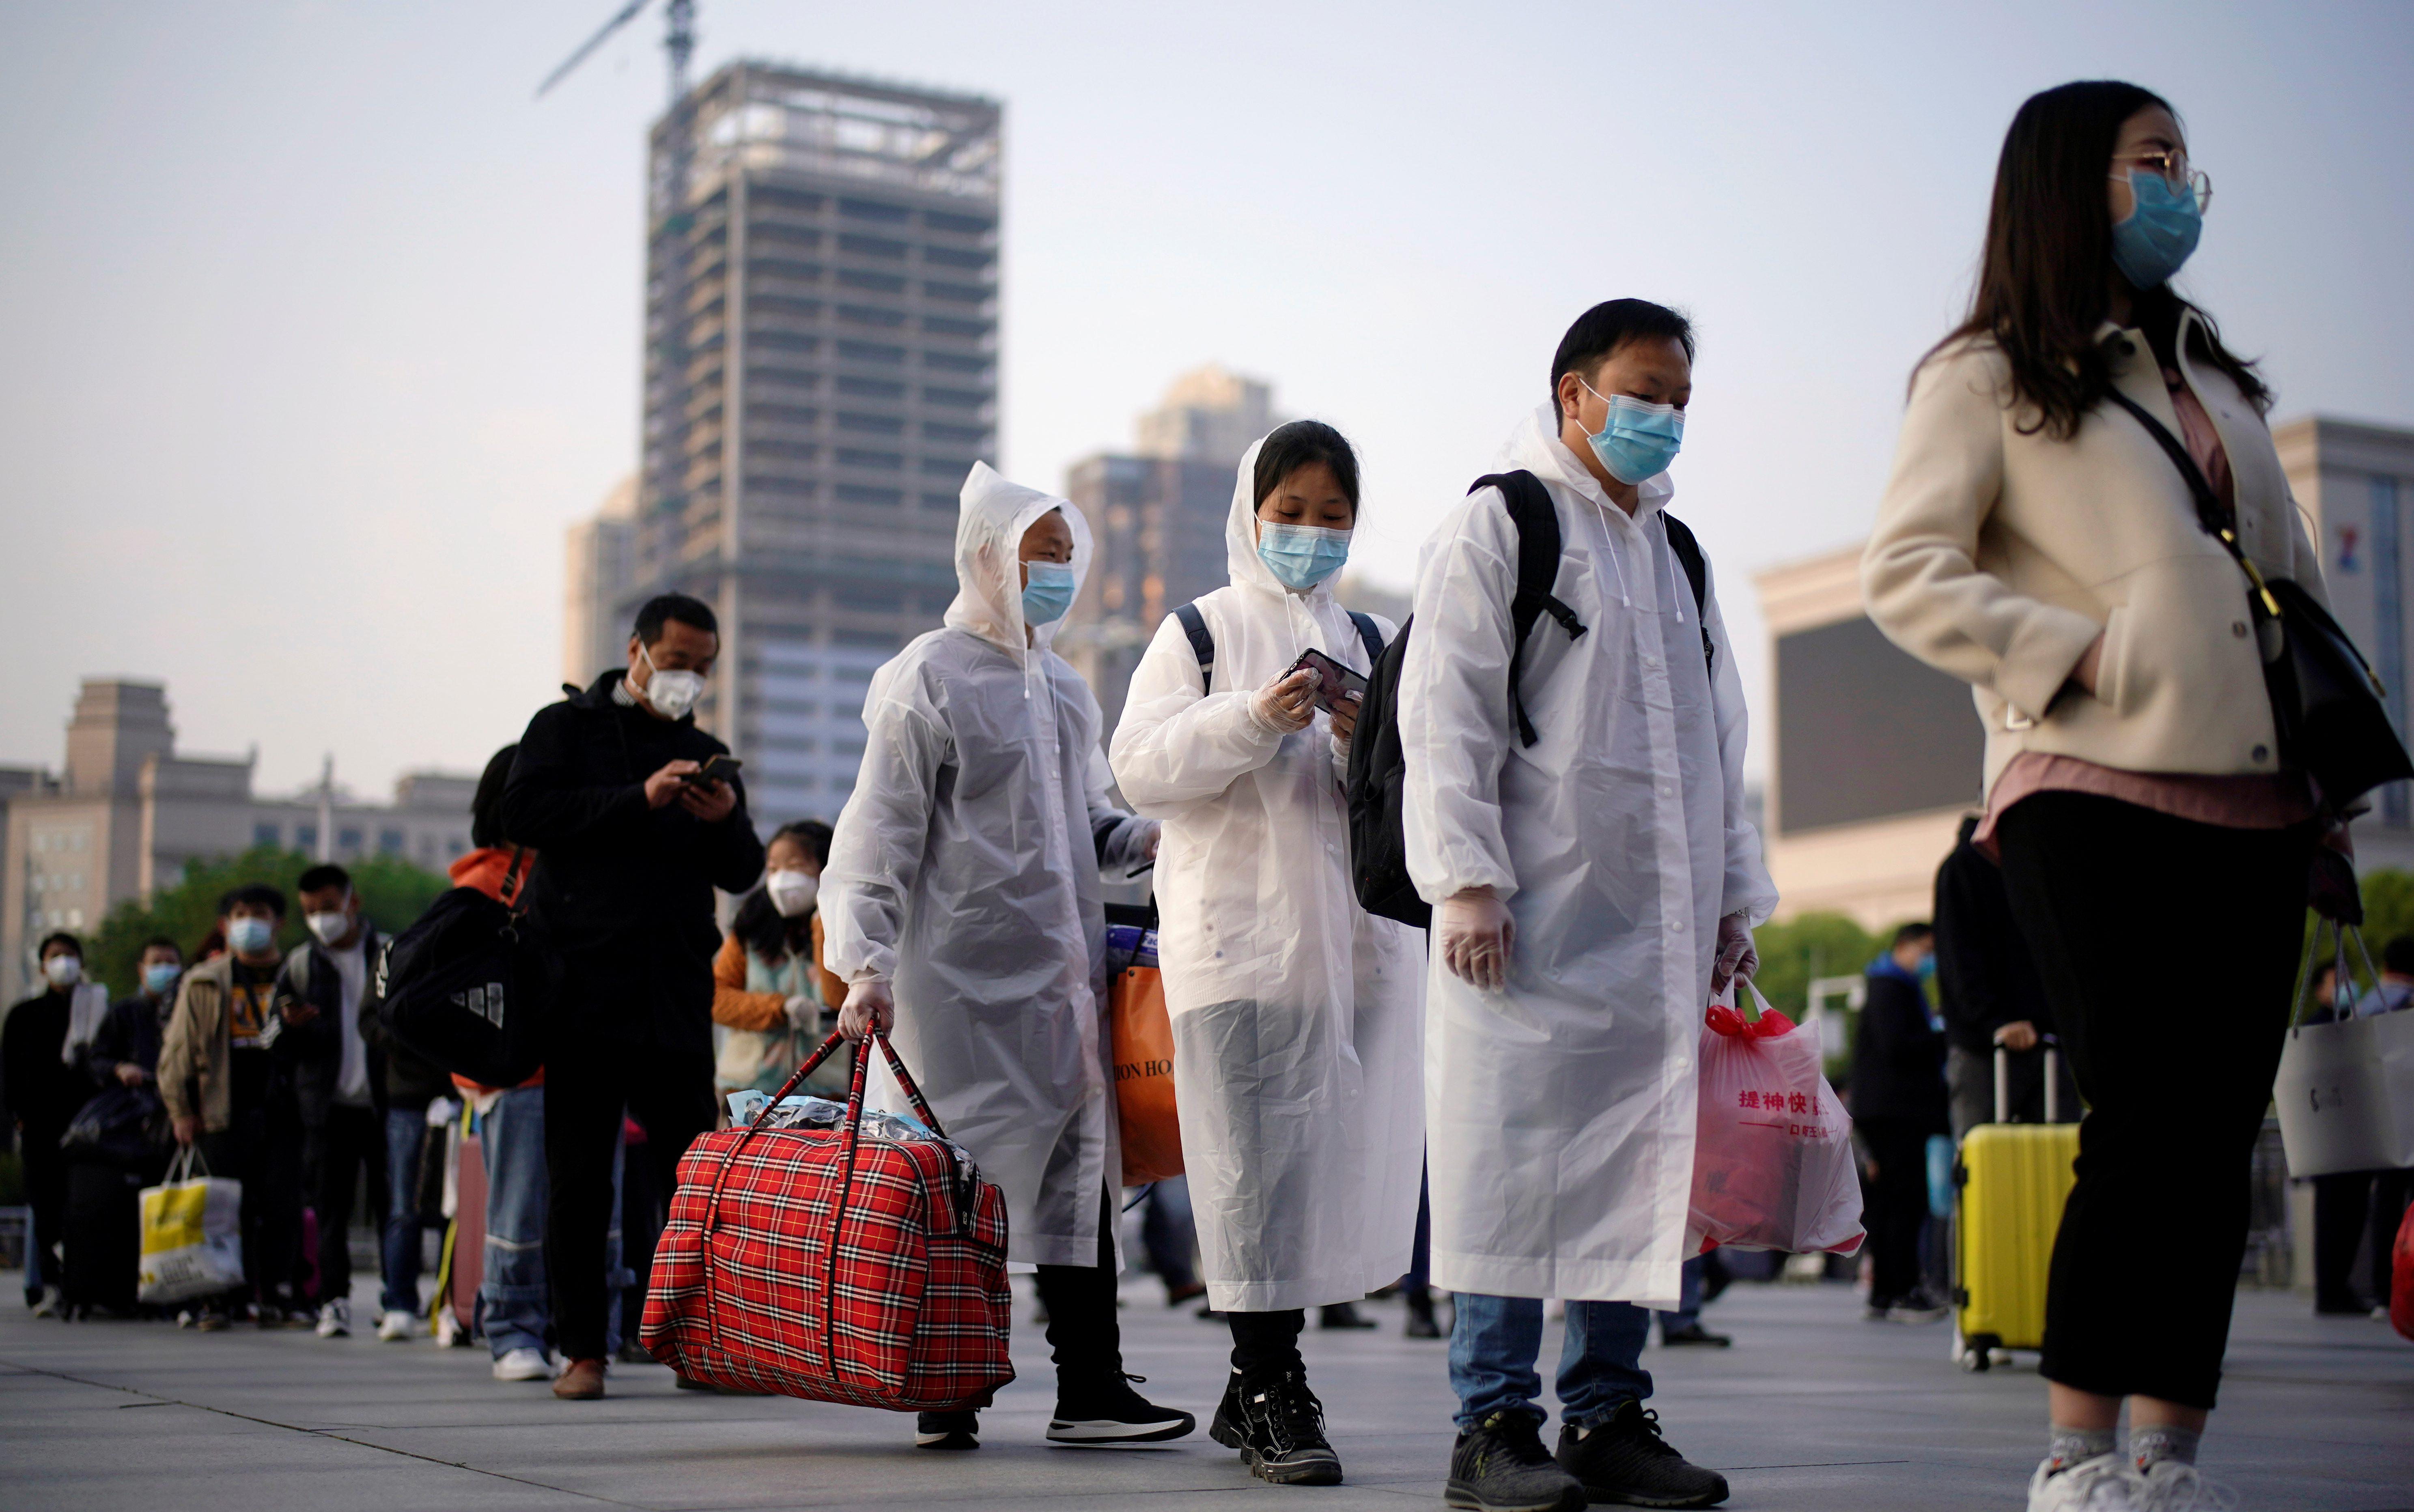 Wuhan, China lifts coronavirus lockdown after 77 days — Quartz